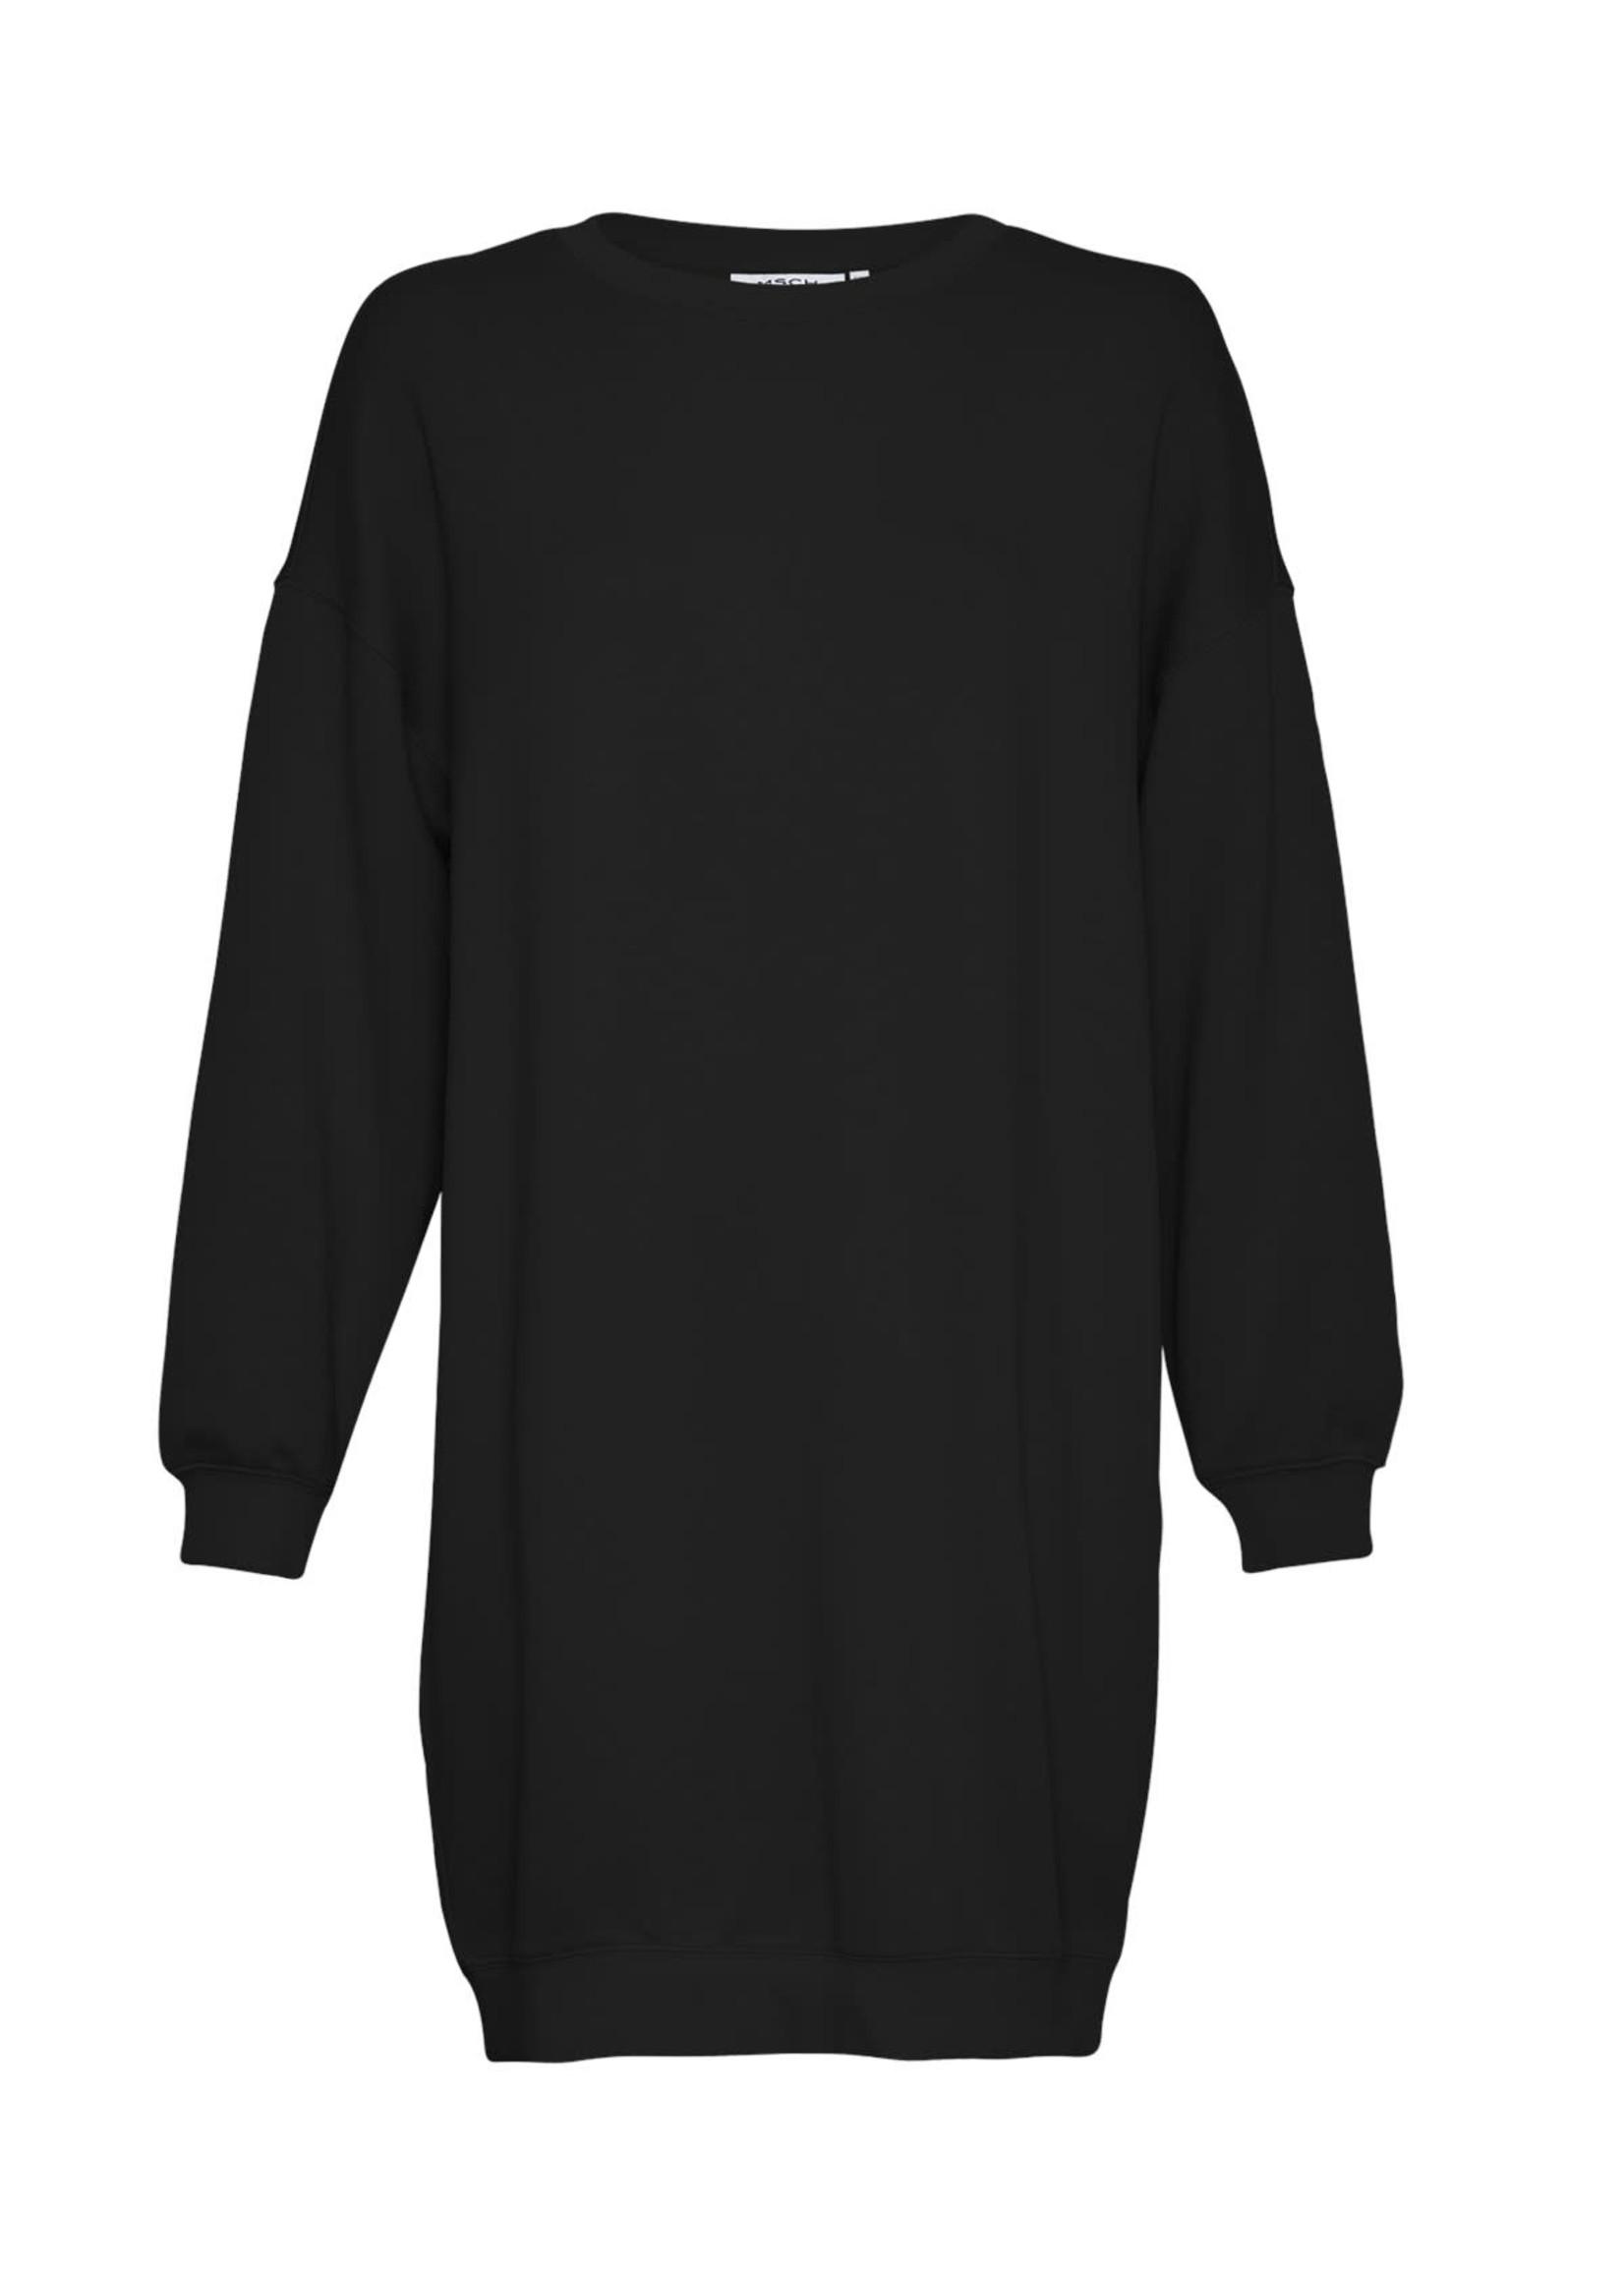 MSCH IMA SWEAT DRESS black